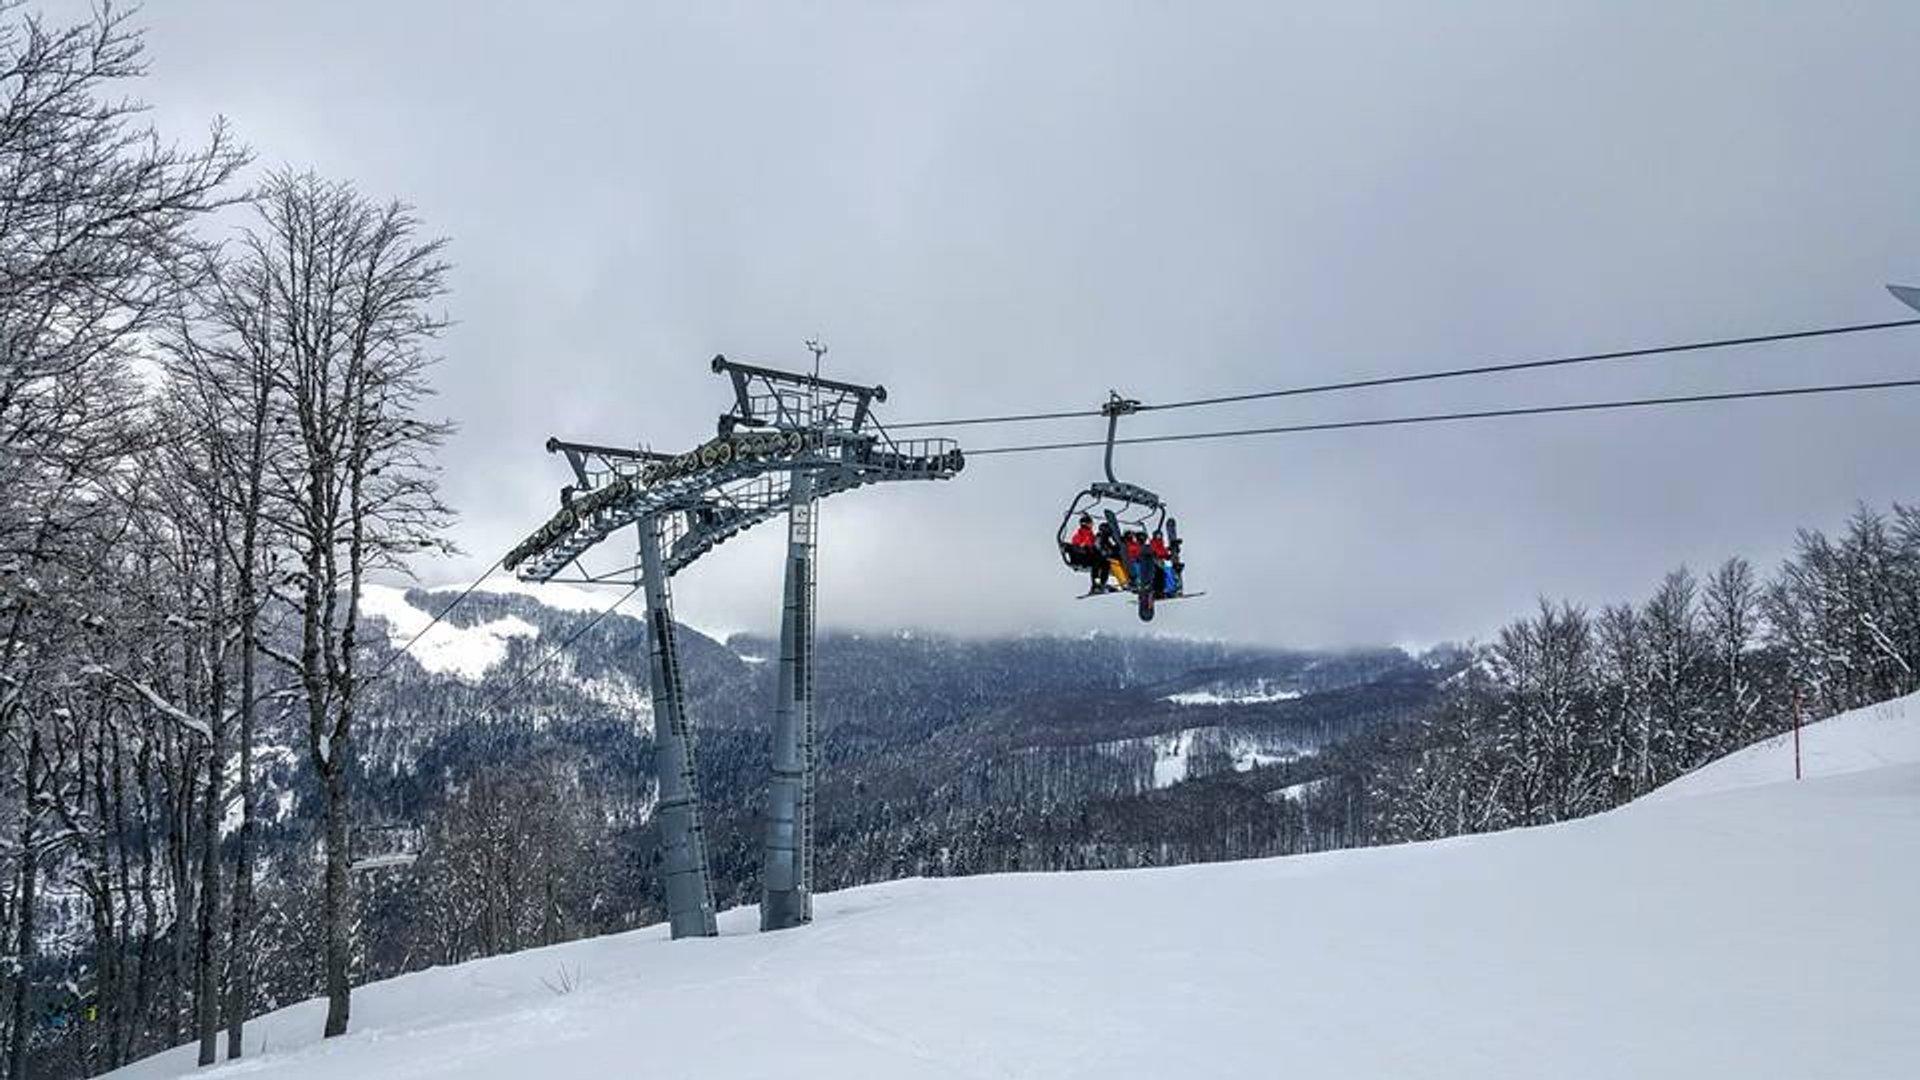 Skiing and Snowboarding in Montenegro - Best Season 2019